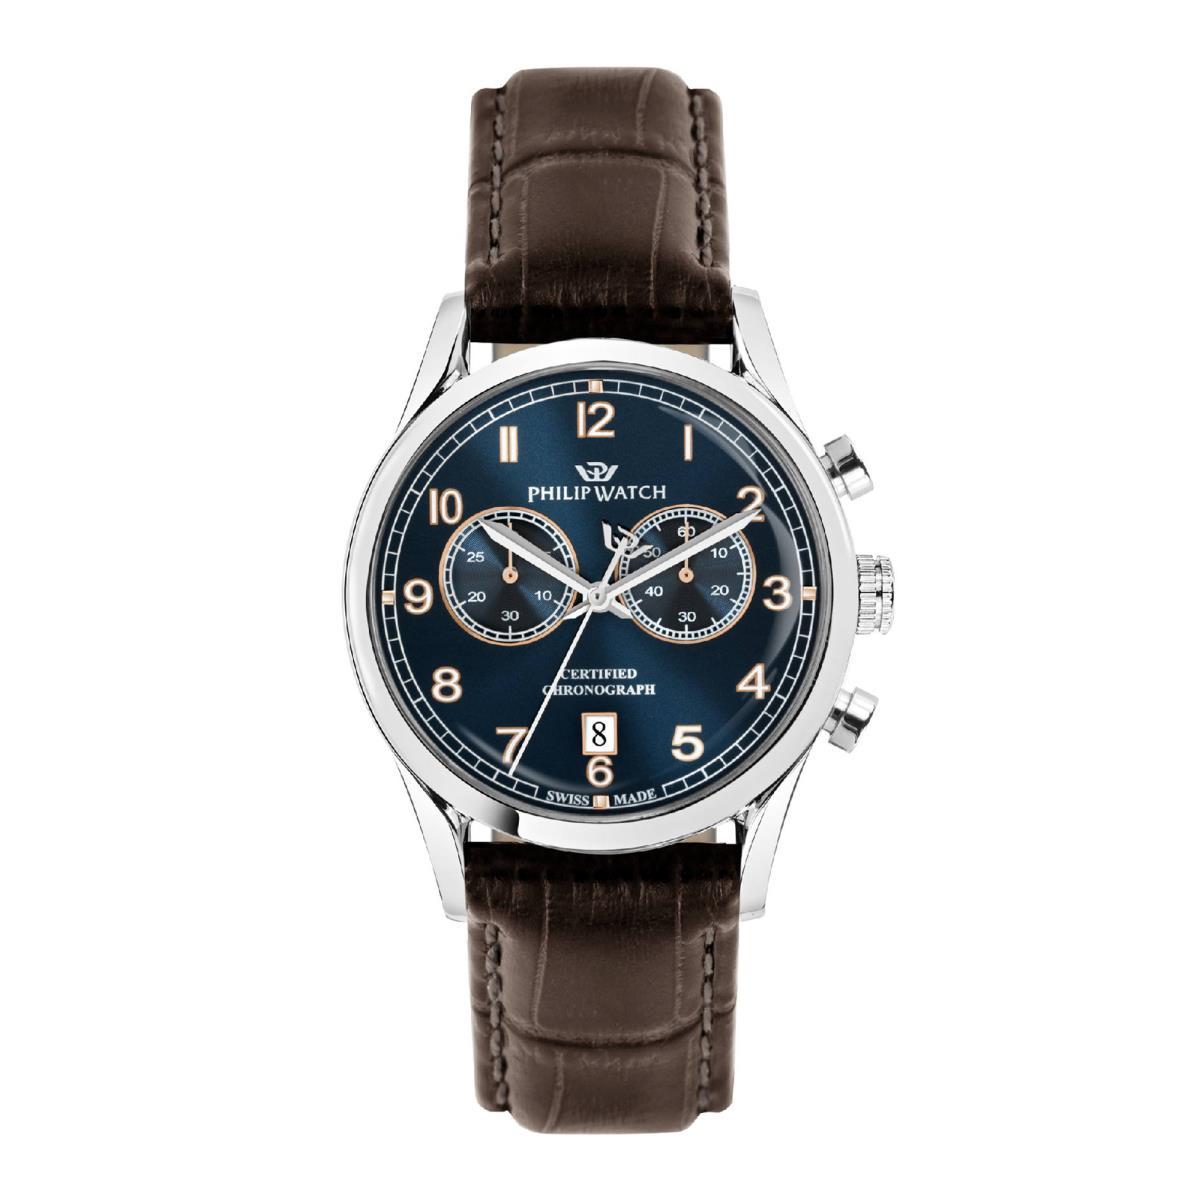 Orologio Philip Watch - Sunray Ref. R8271908005 - PHILIP WATCH